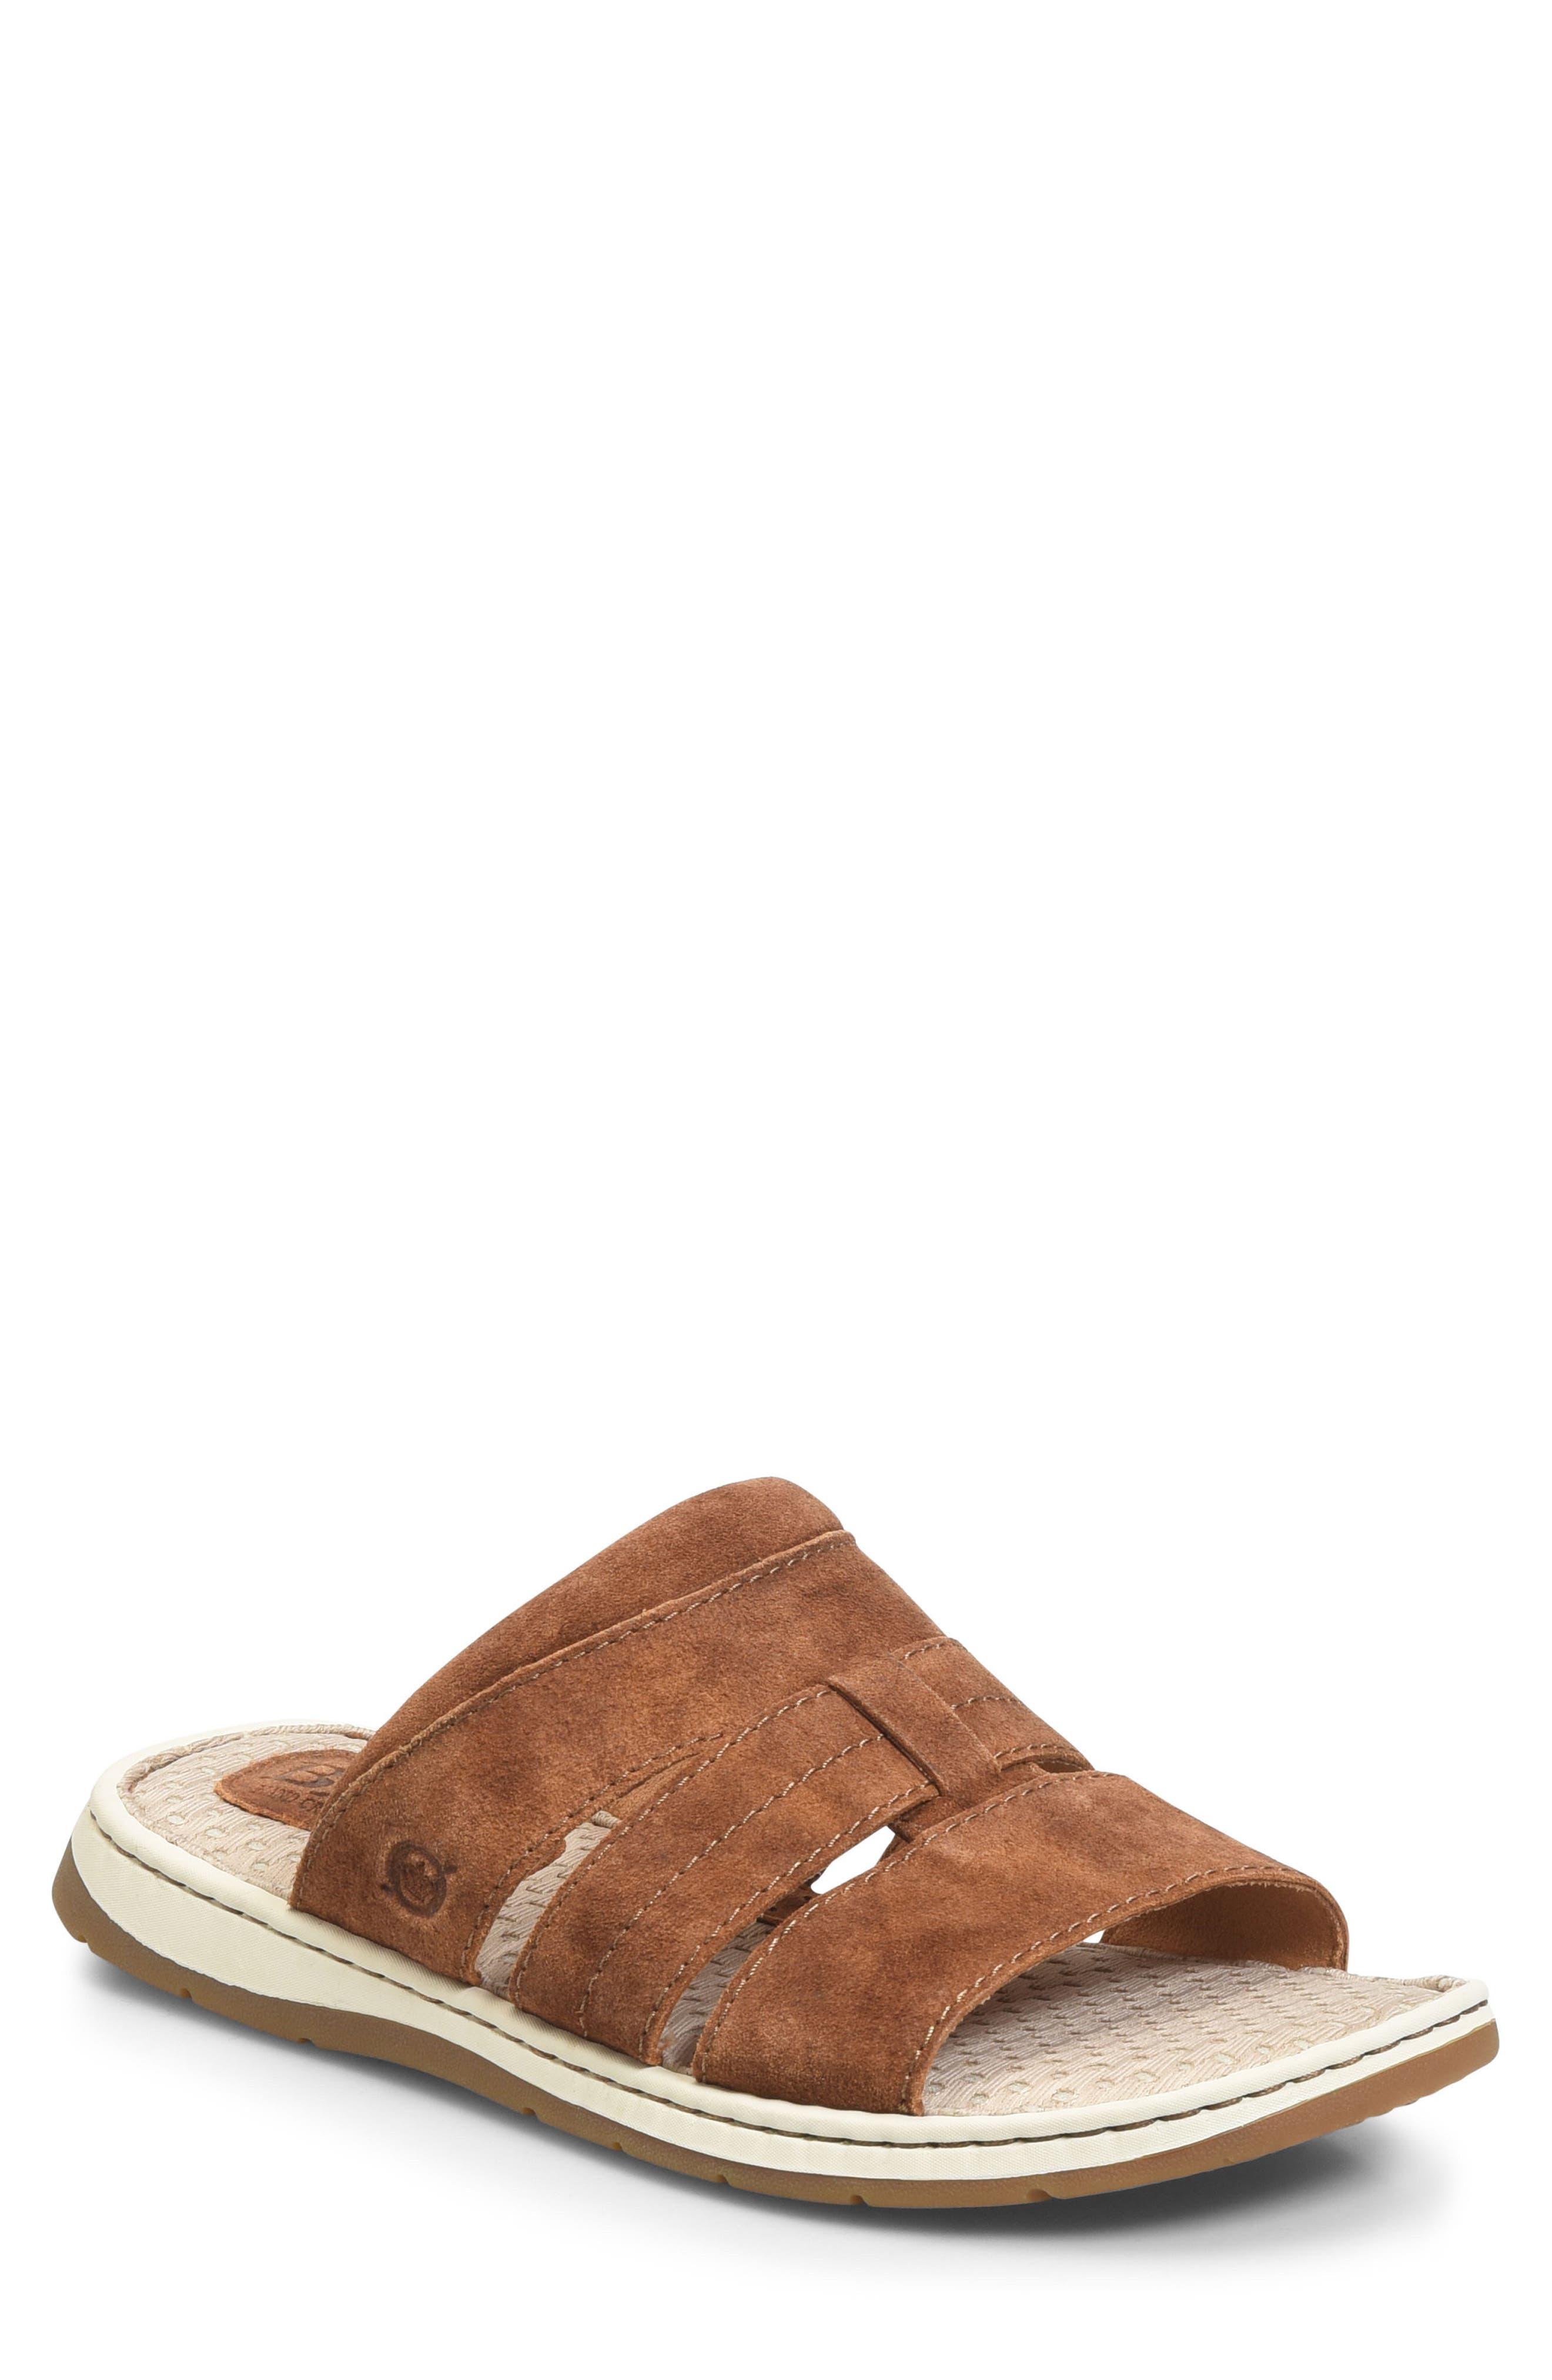 Sail Slide Sandal,                         Main,                         color, Rust Leather